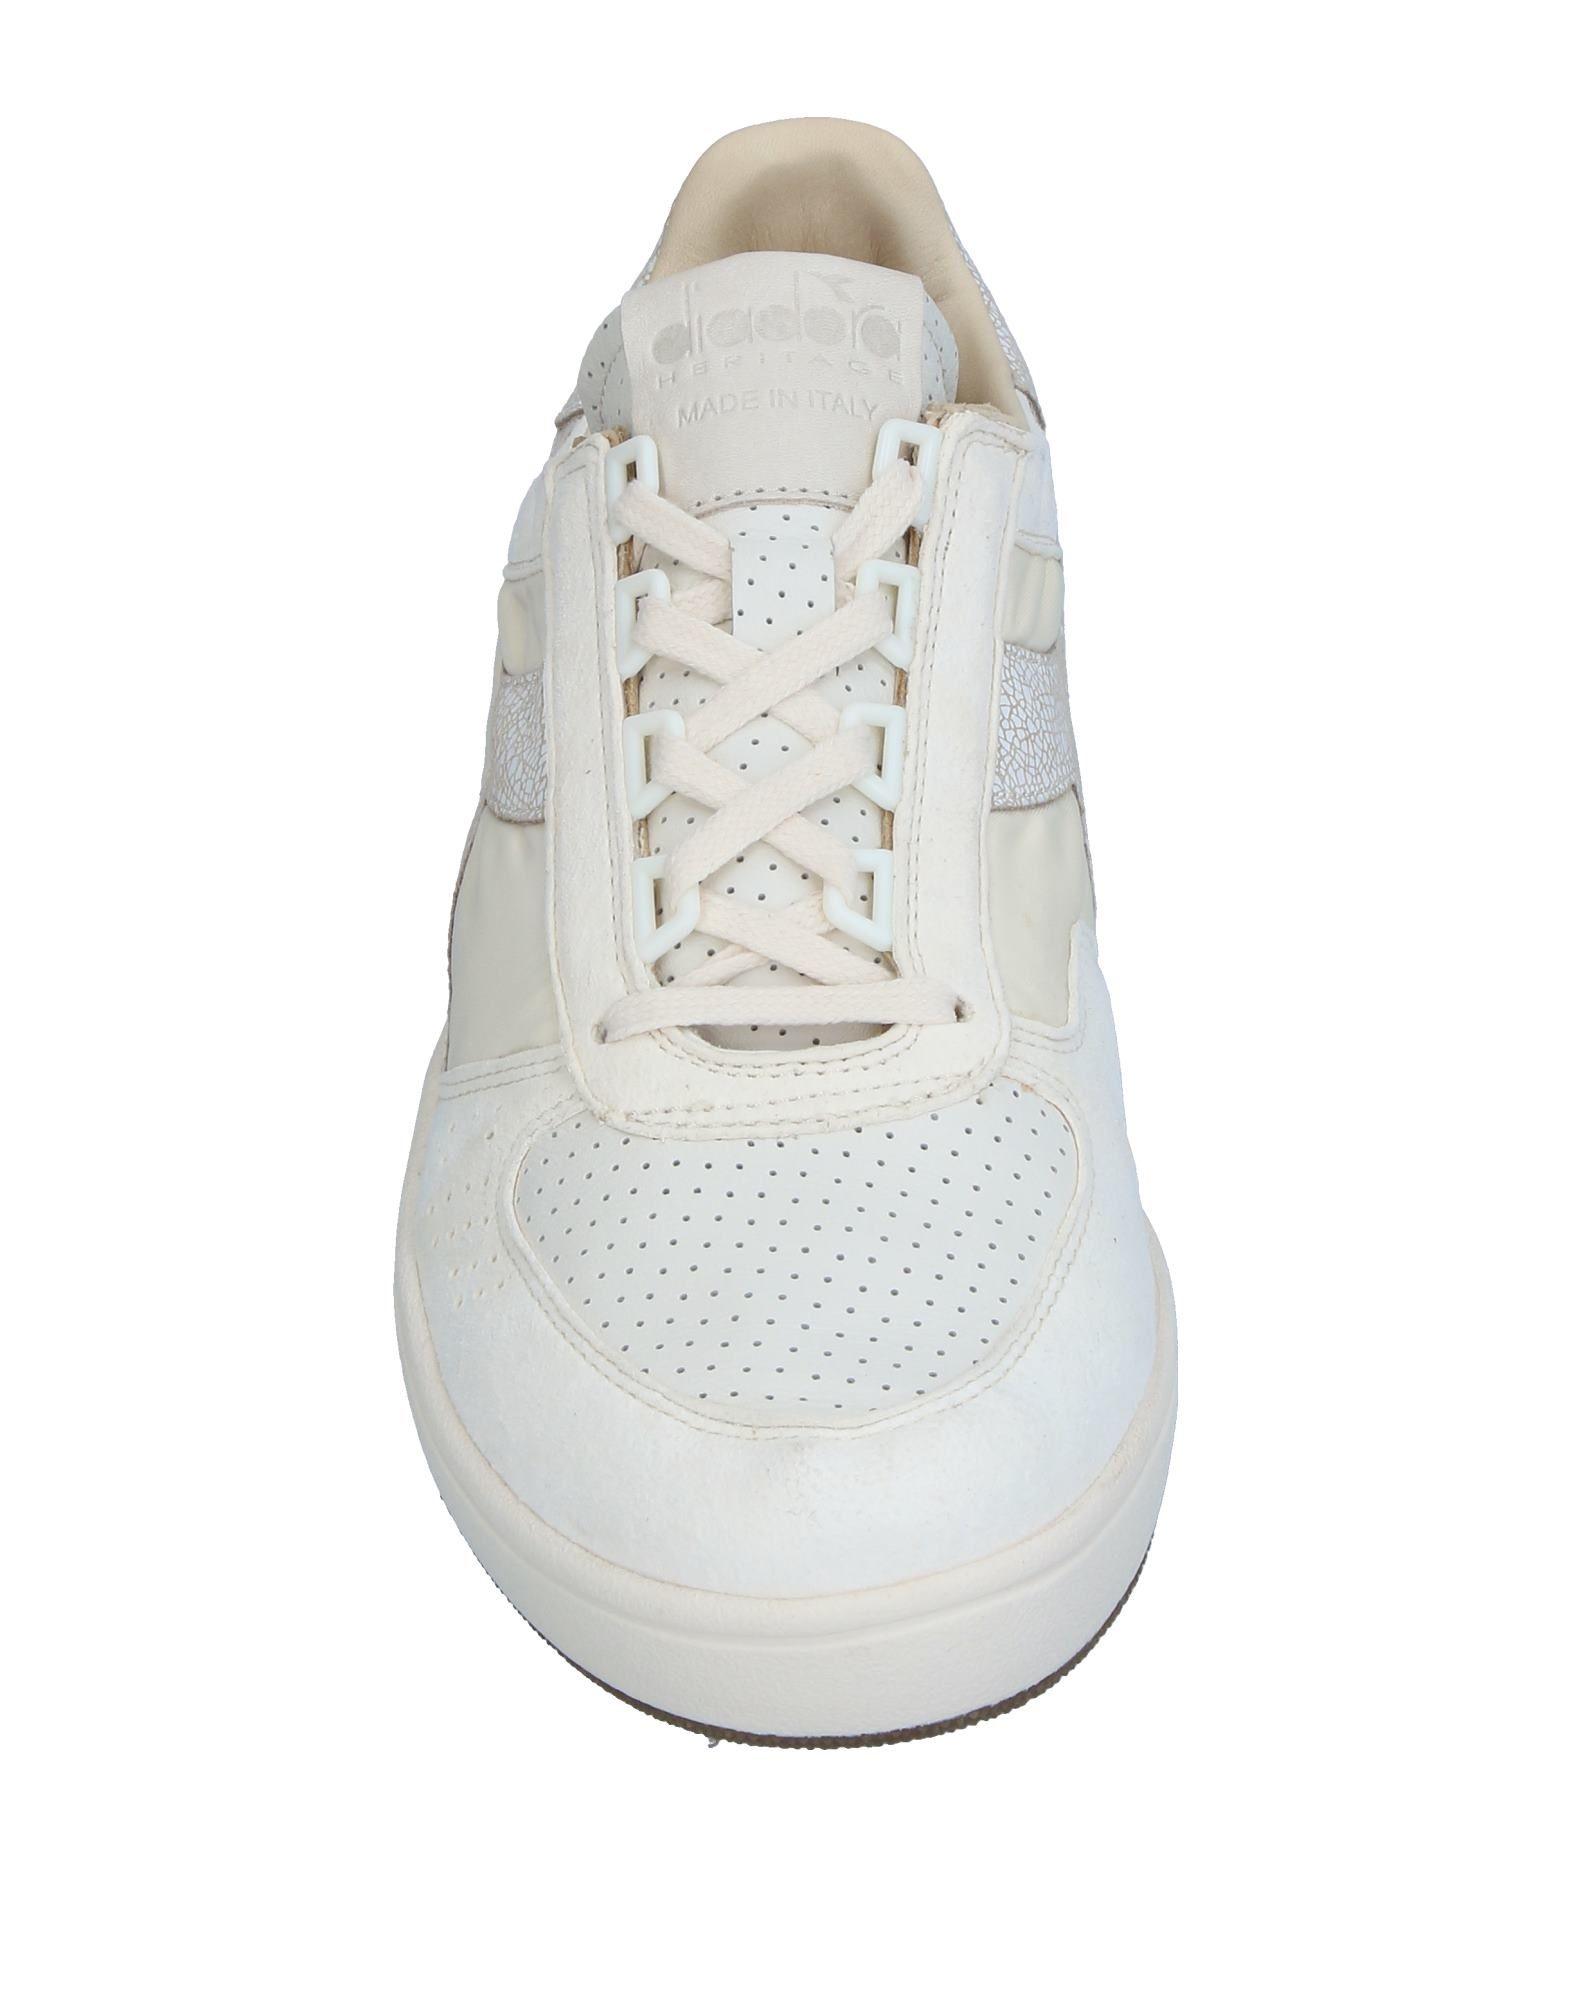 Sneakers Diadora Uomo Heritage Uomo Diadora - 11357036GK f101f0